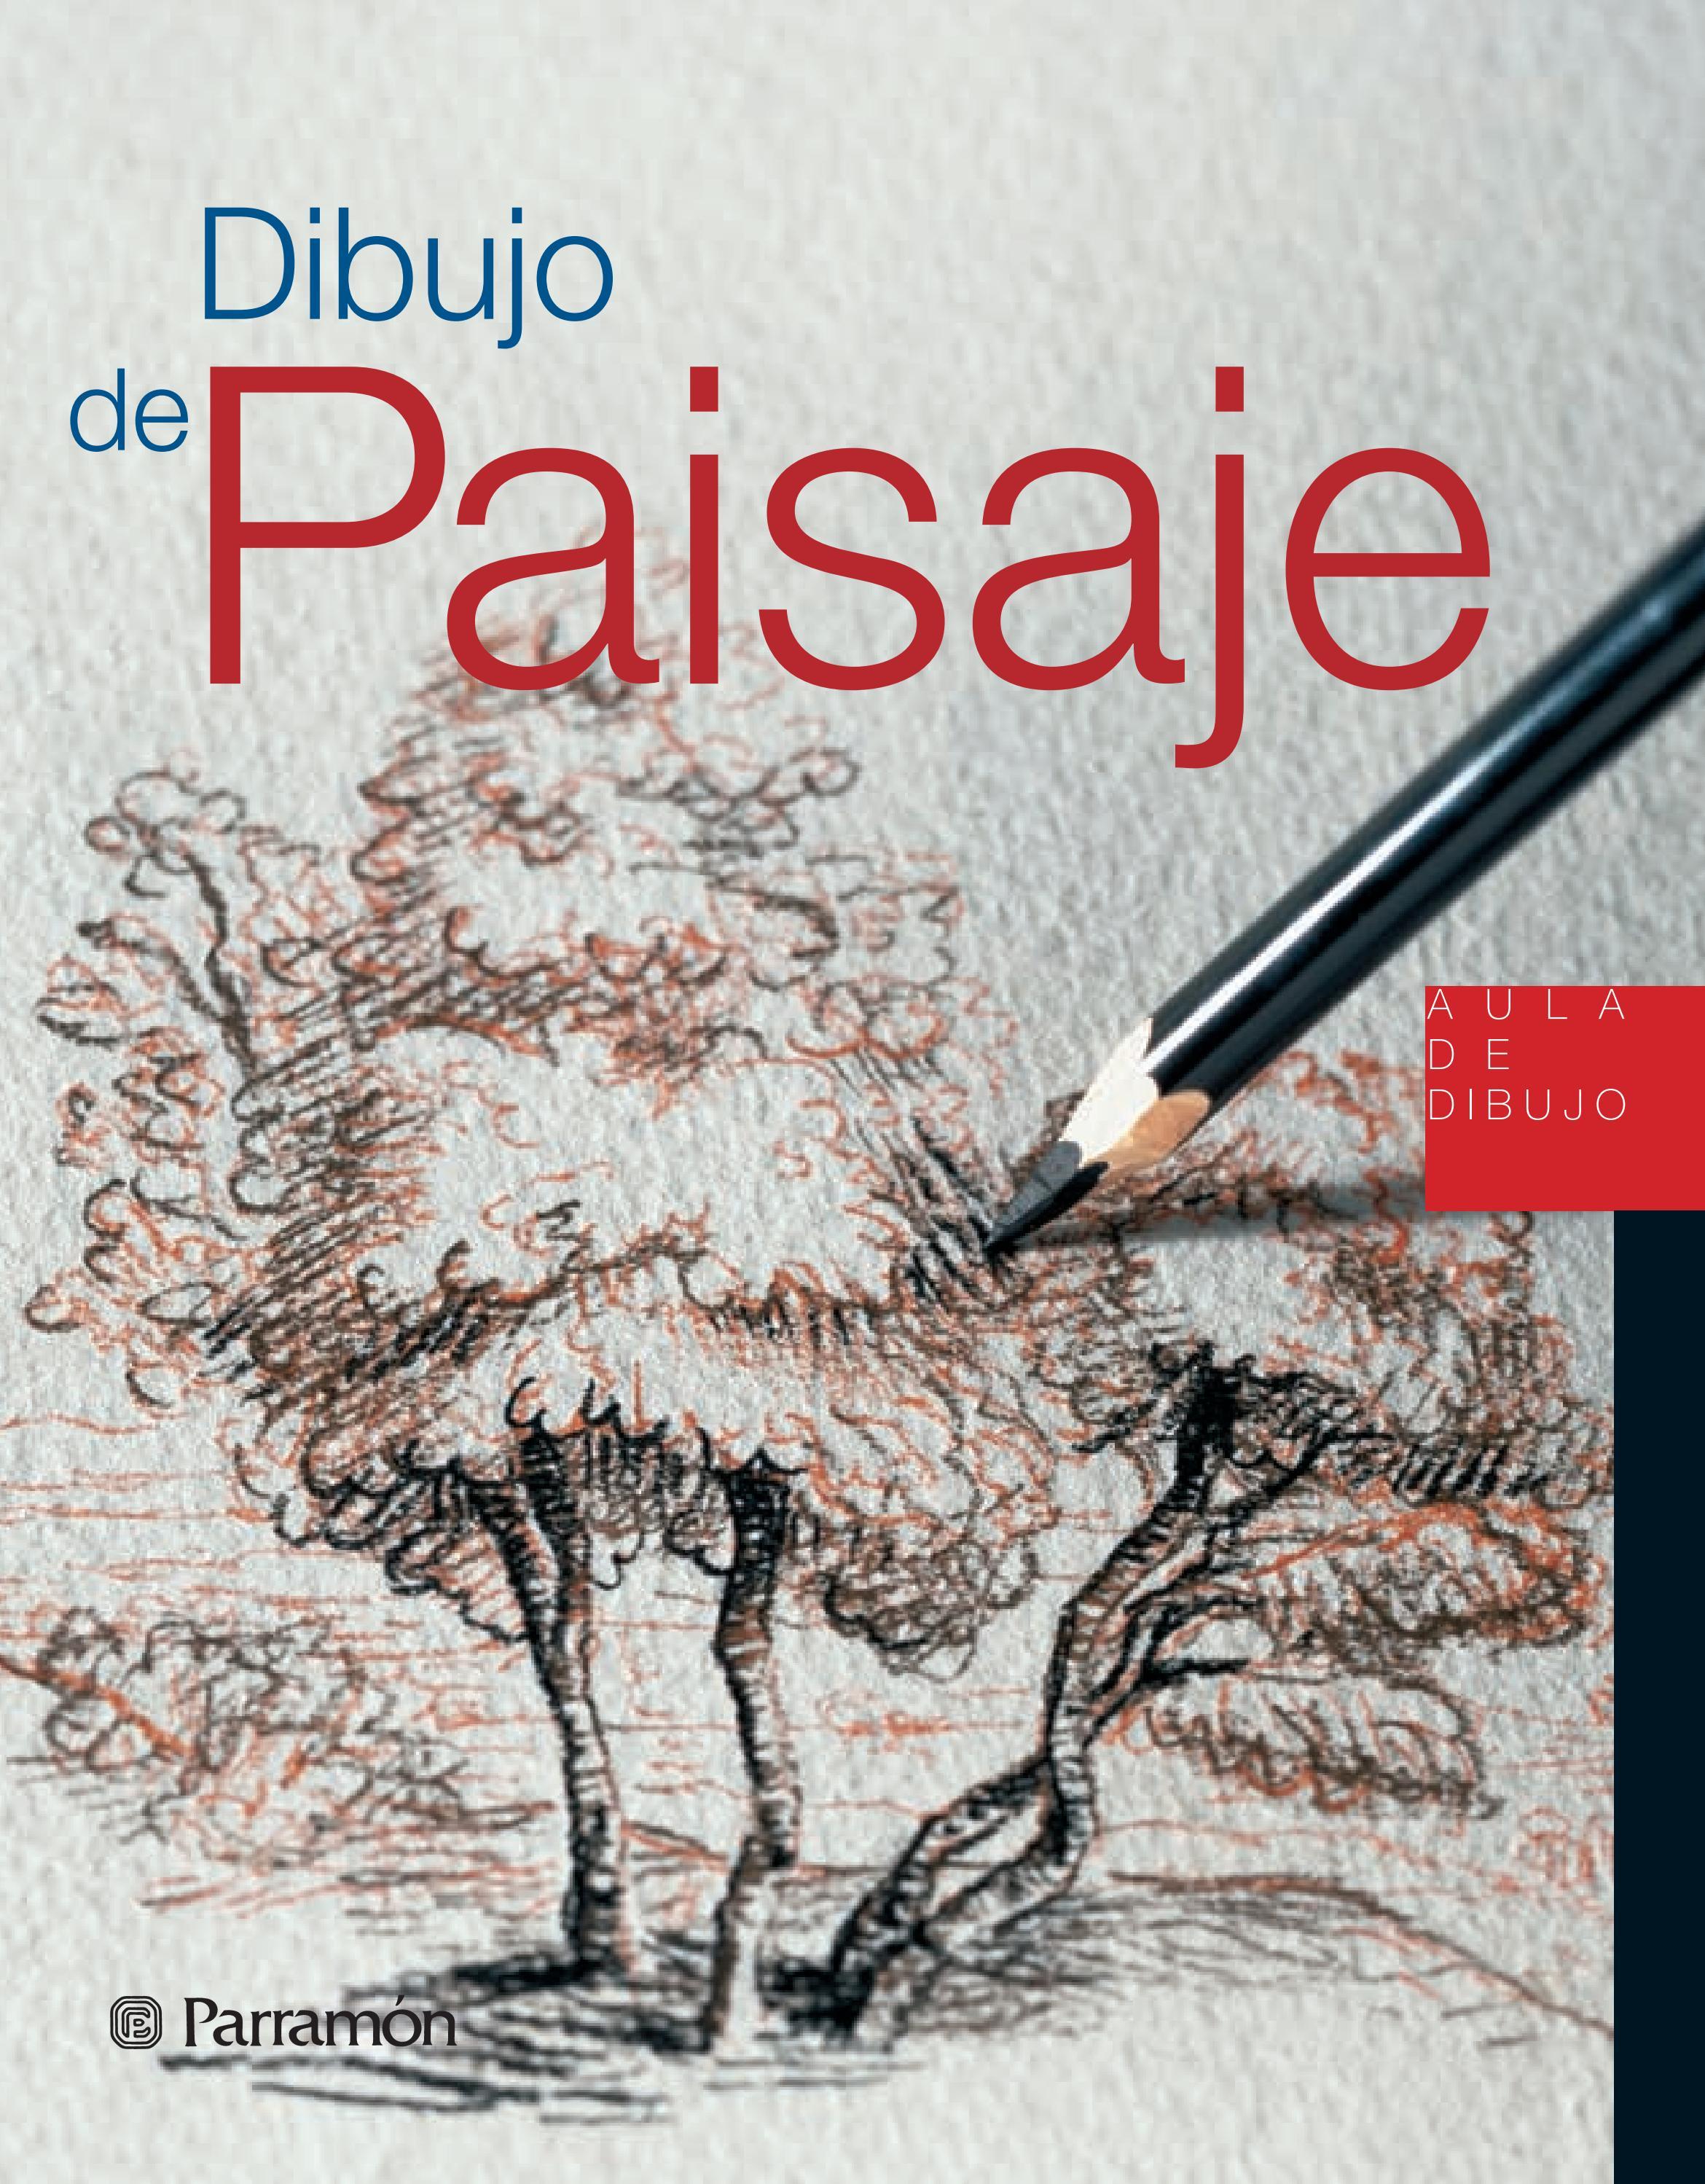 Aula de dibujo - Dibujo de Paisaje by Parramón ediciones, s.a. - issuu